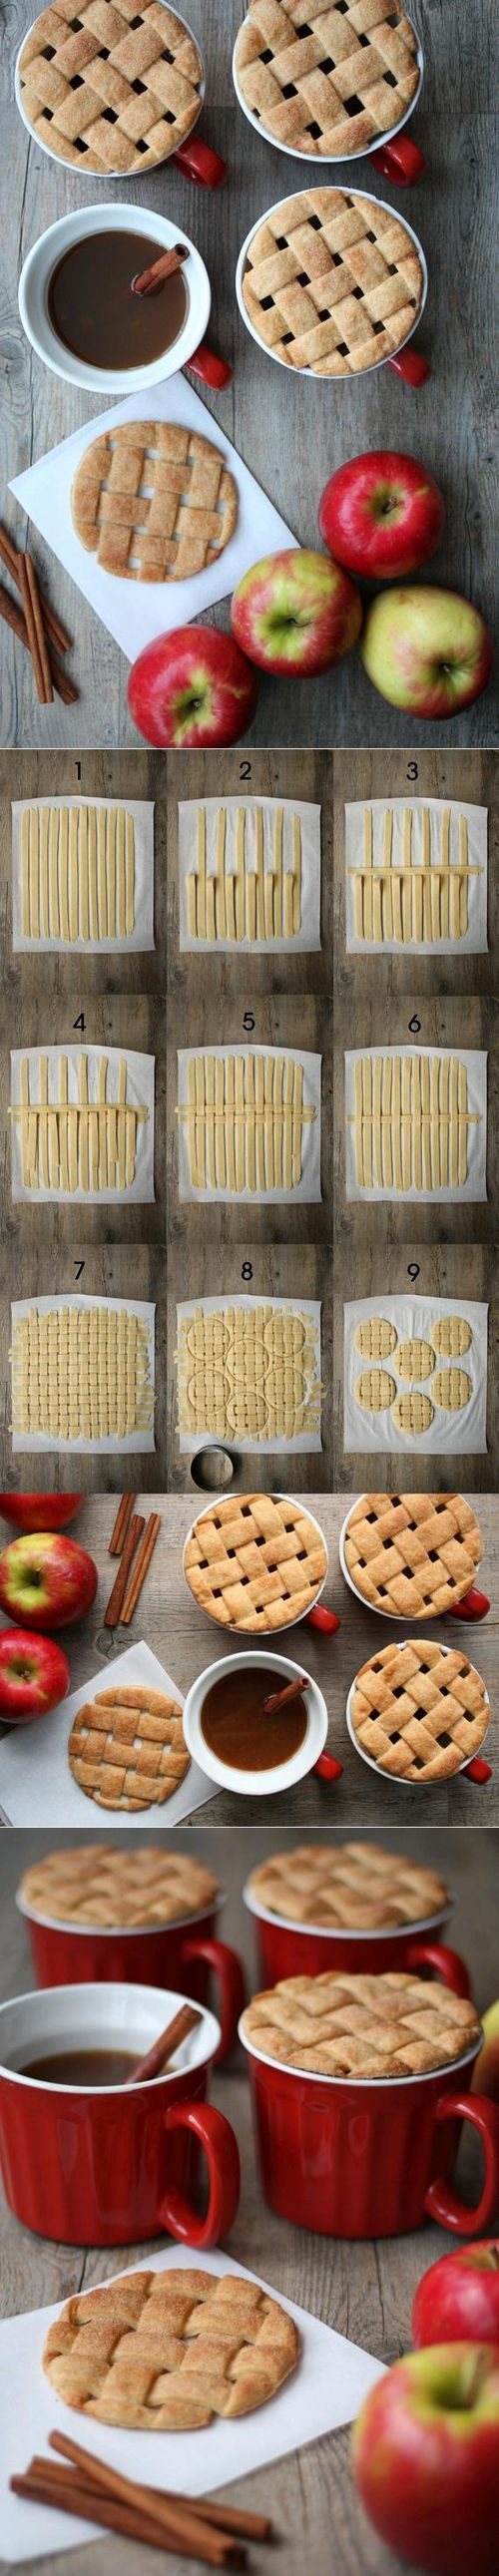 DIY Pie Mug Toppers DIY Projects / UsefulDIY.com